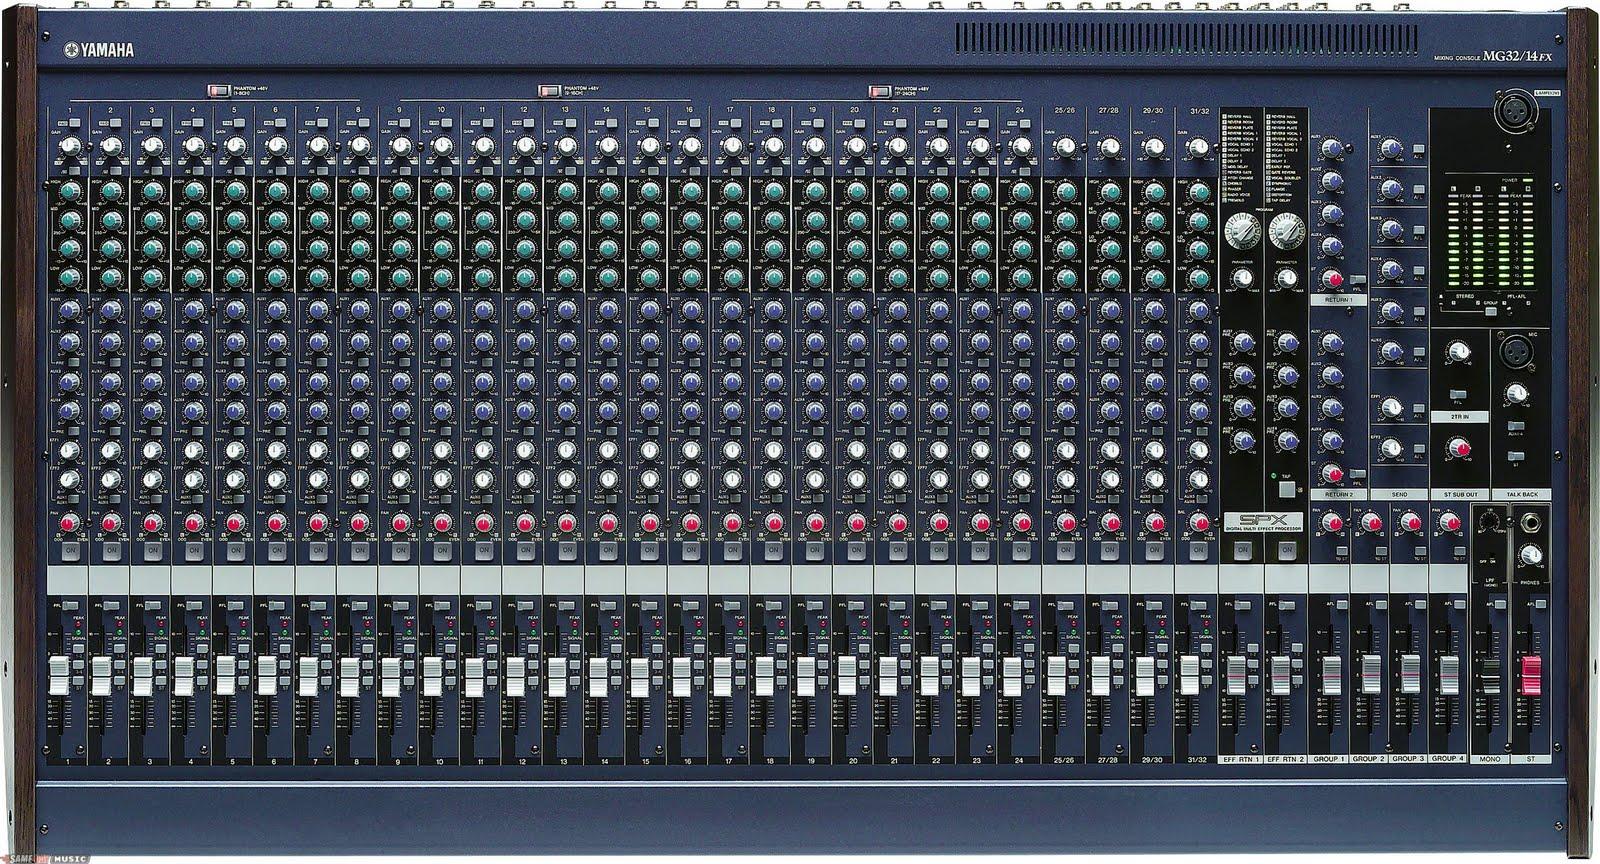 fans music mixer sound system. Black Bedroom Furniture Sets. Home Design Ideas